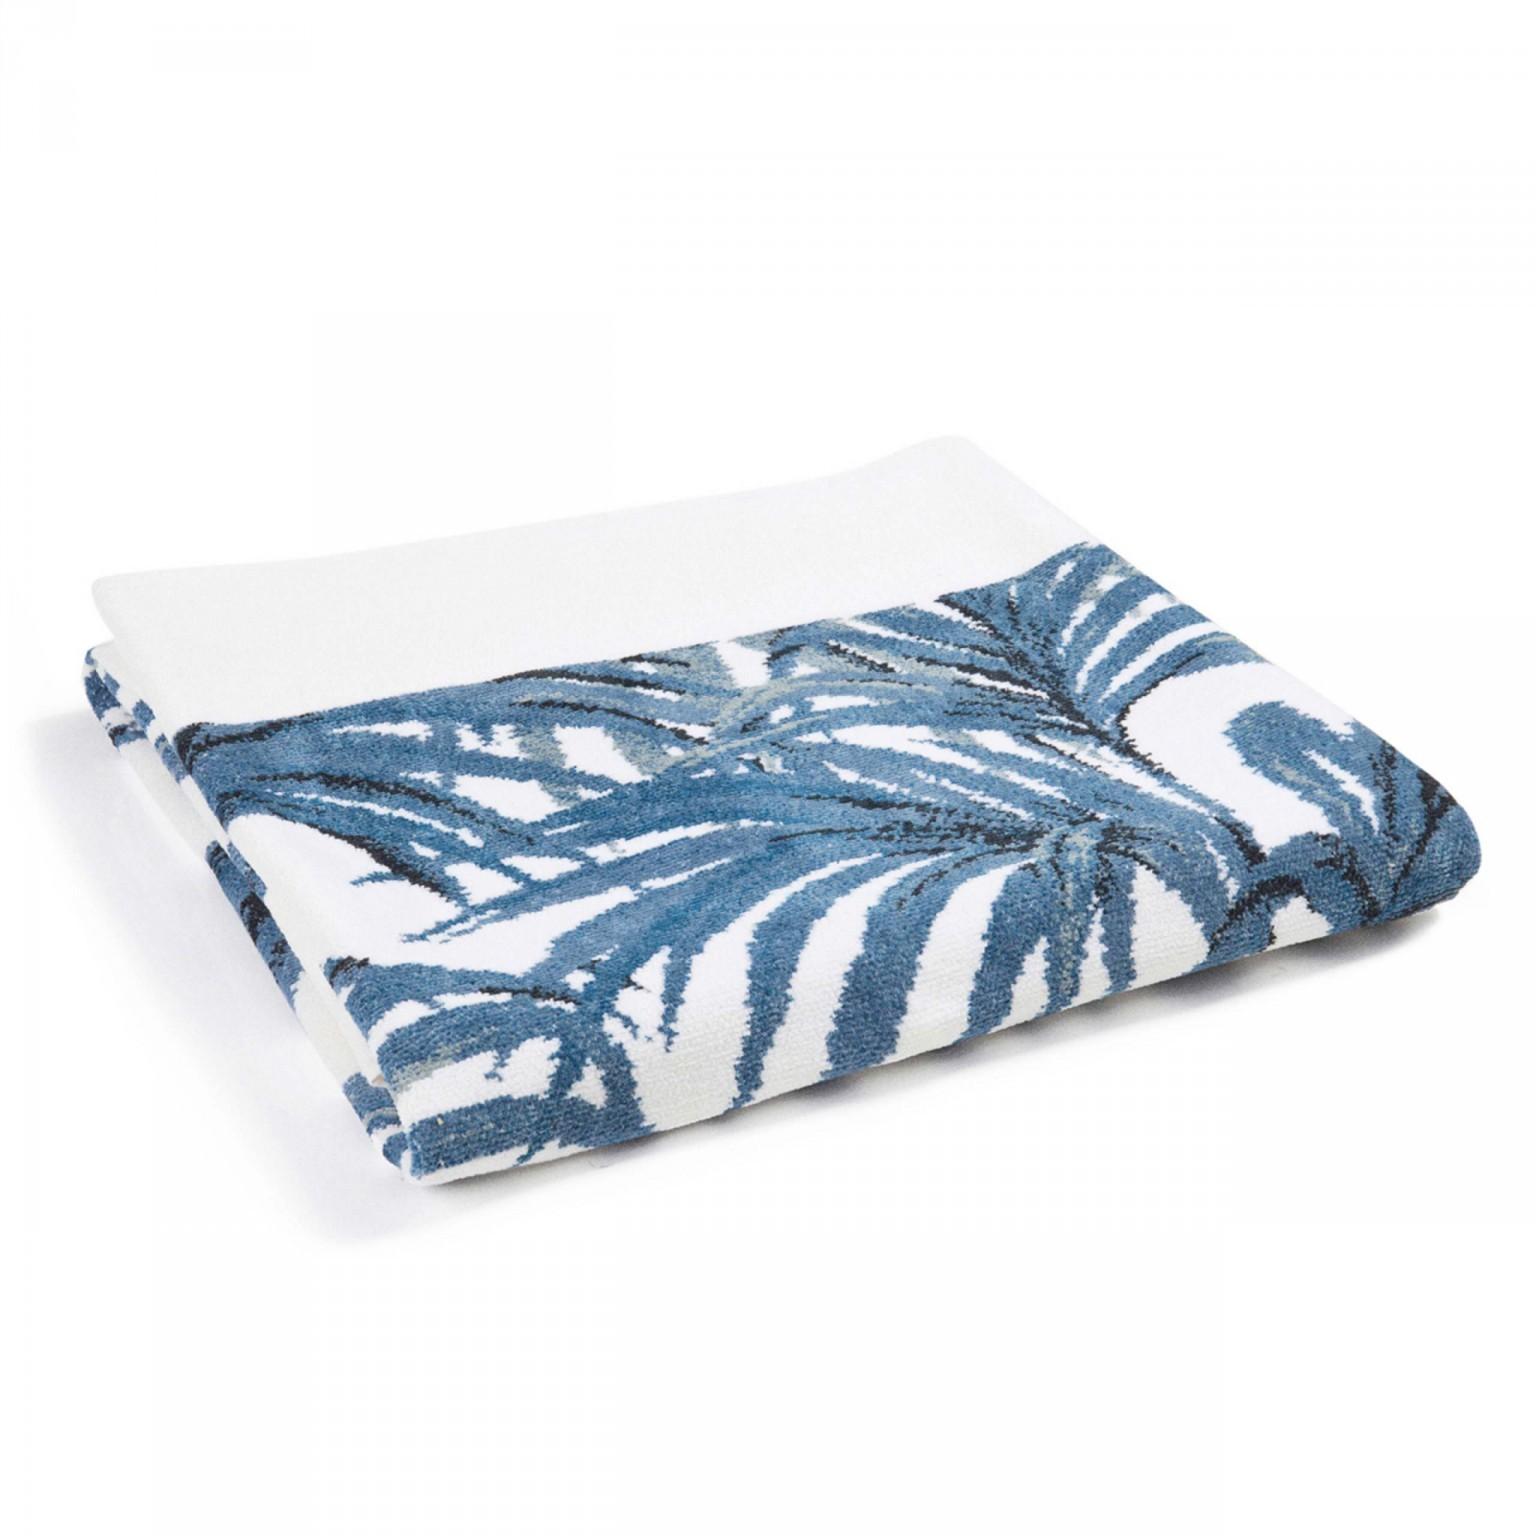 palmeral white azure bath sheet 1 2 2 - Håndkle - Palmeral, hvit/blå